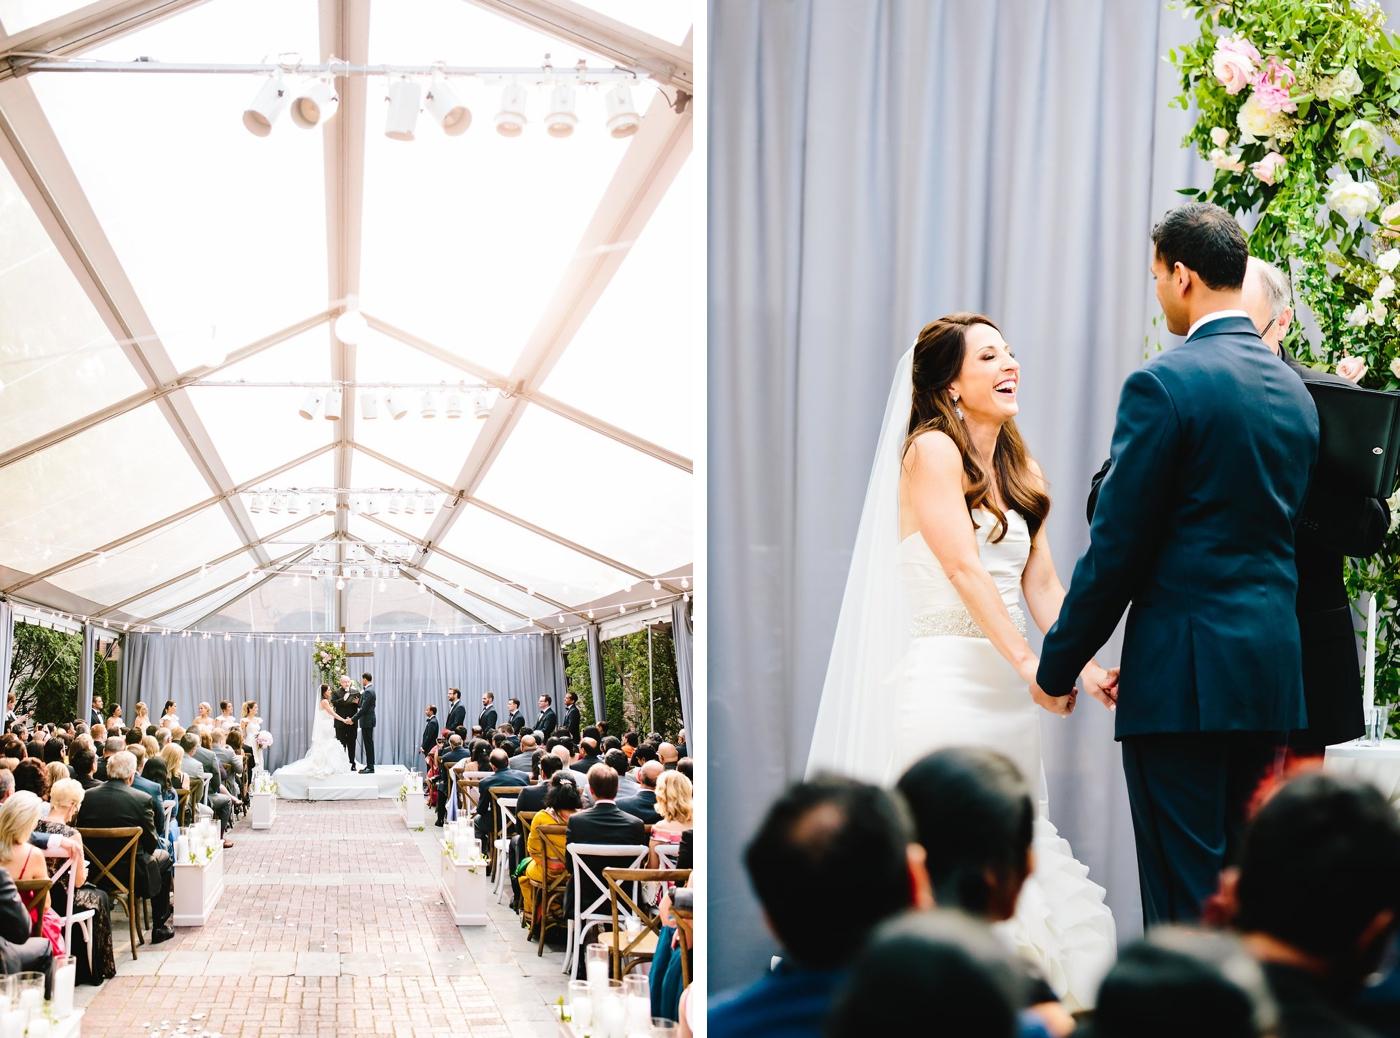 chicago-fine-art-wedding-photography-sakamuri55